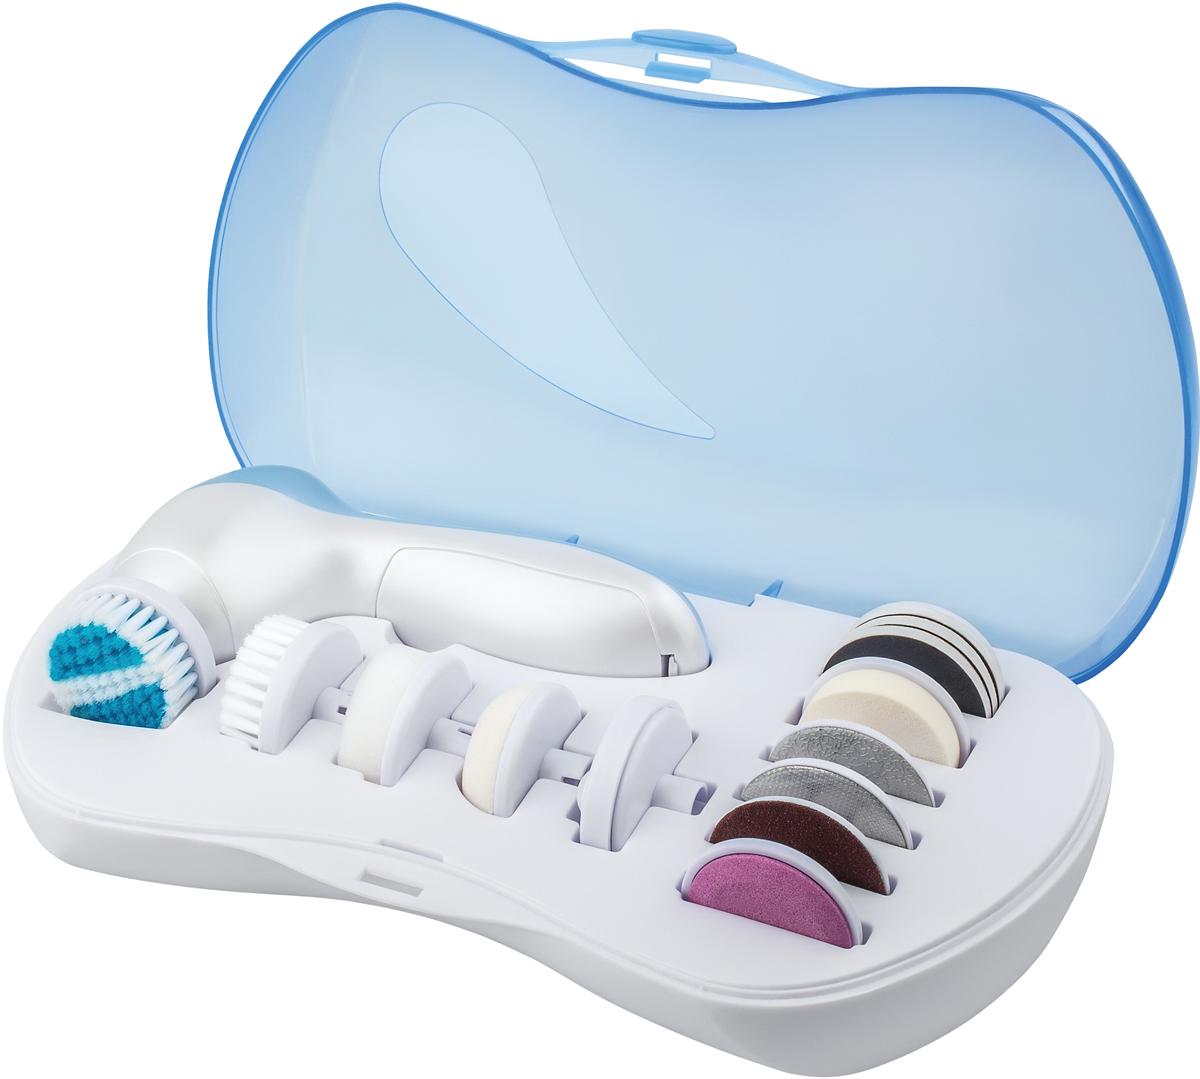 Scarlett SC-CA305M03, Blue косметологический прибор - Косметологические аппараты